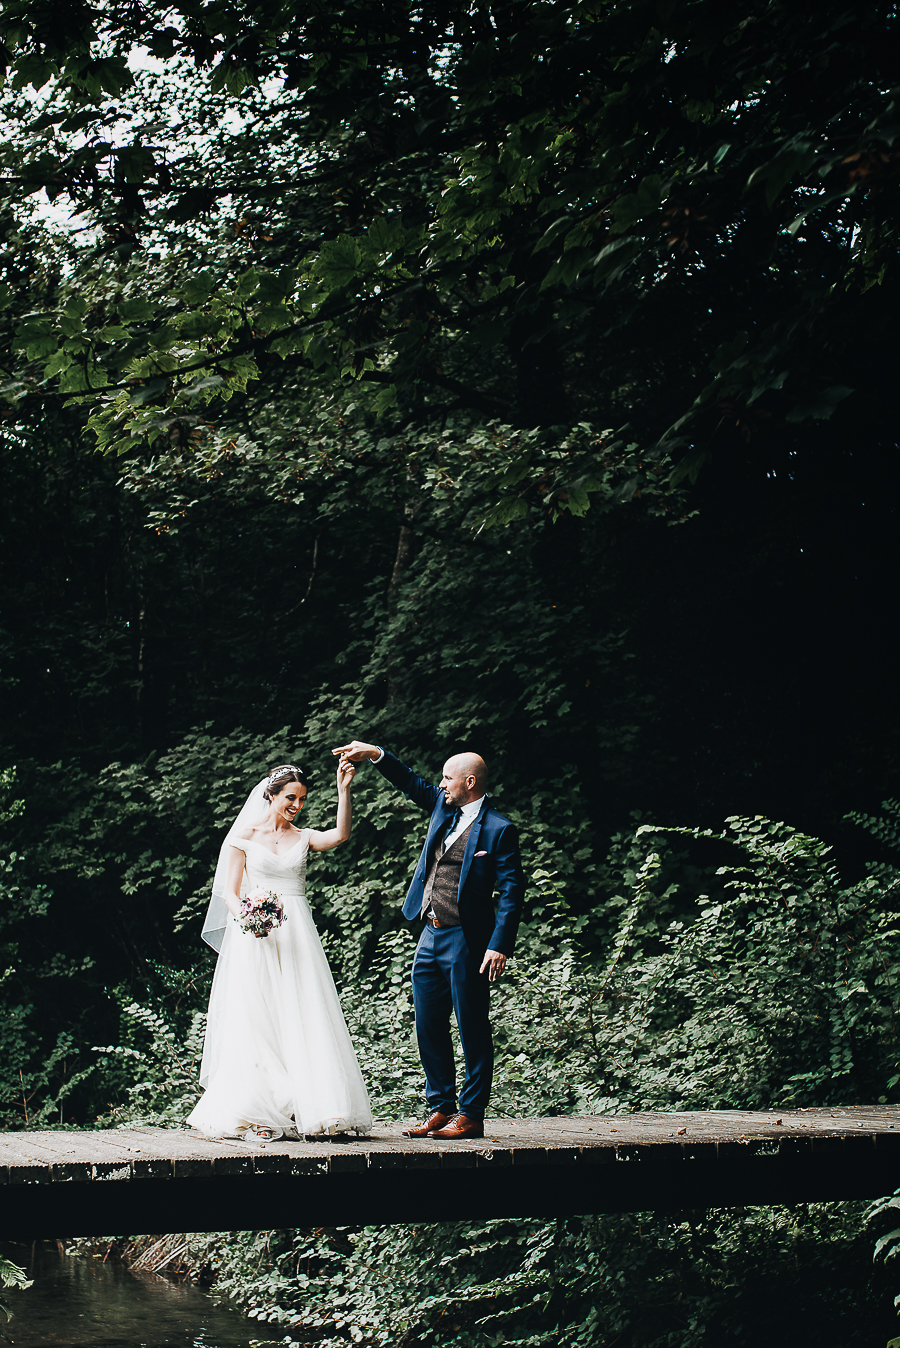 OurBeautifulAdventure-FairyhillWedding-John&Zoe-WeddingBlog-2300.jpg